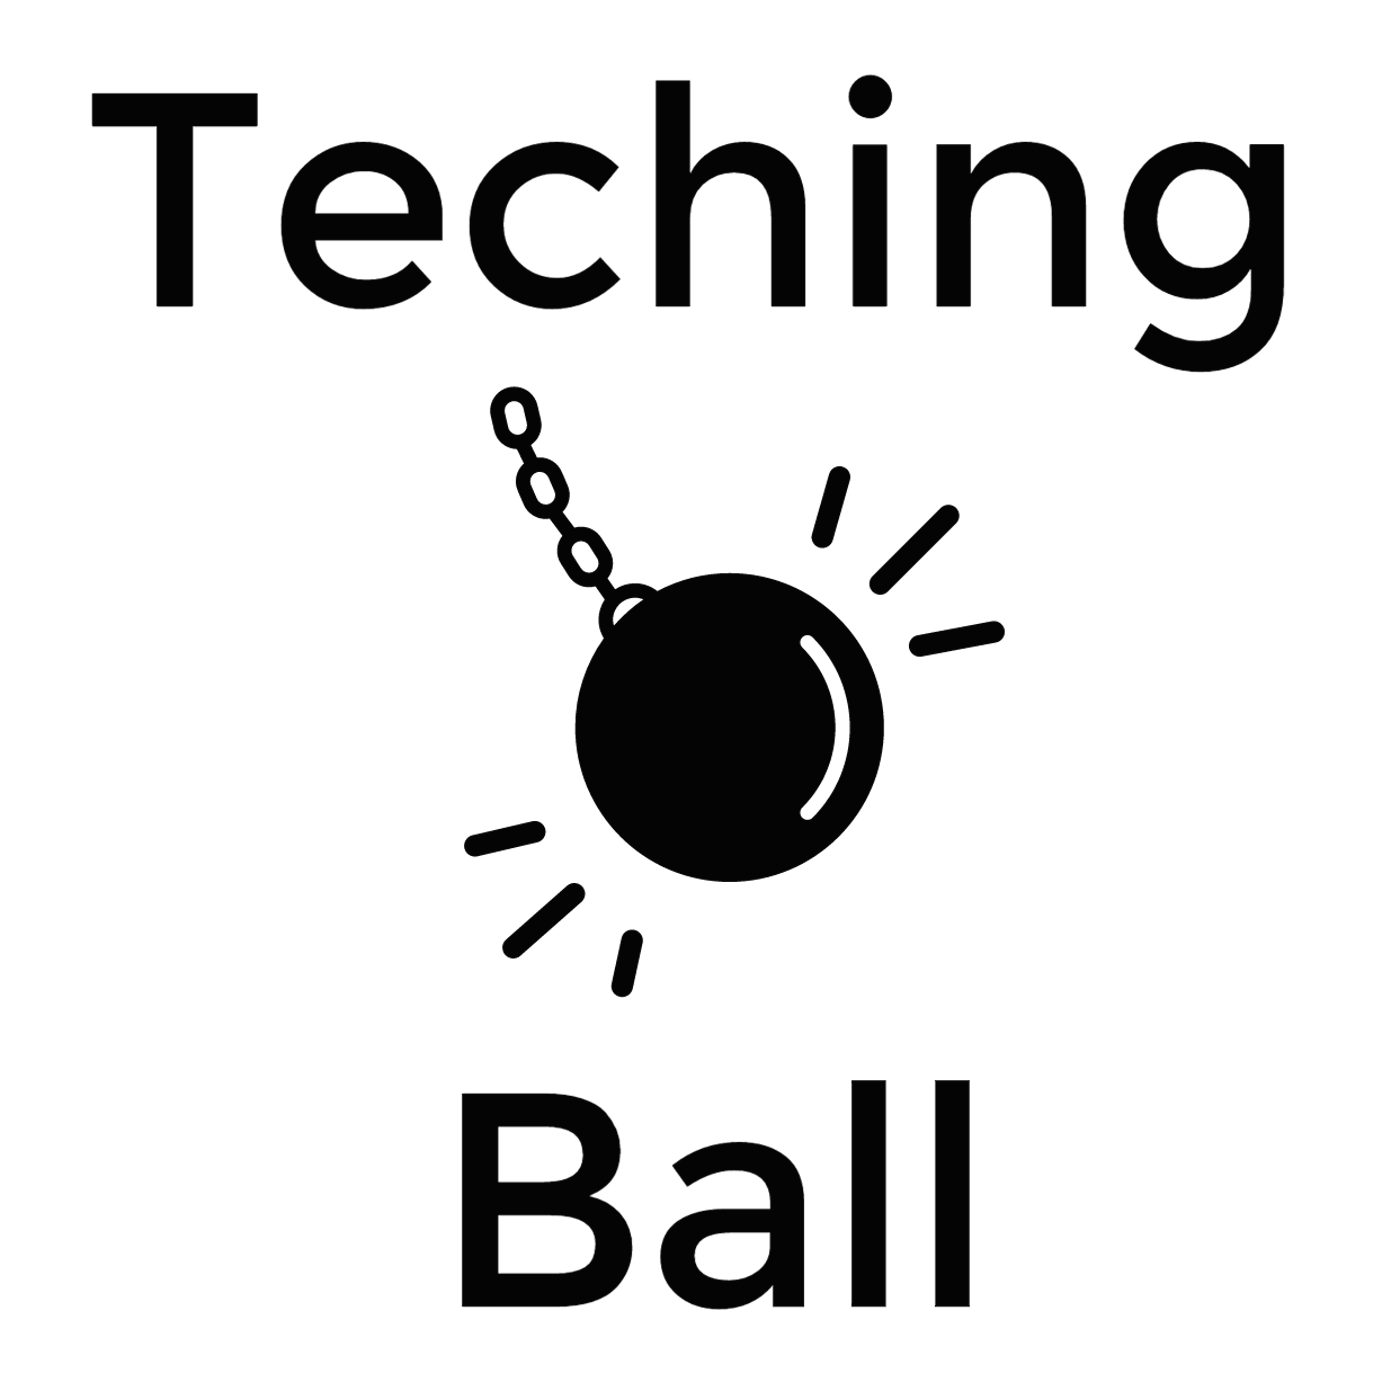 Teching Ball